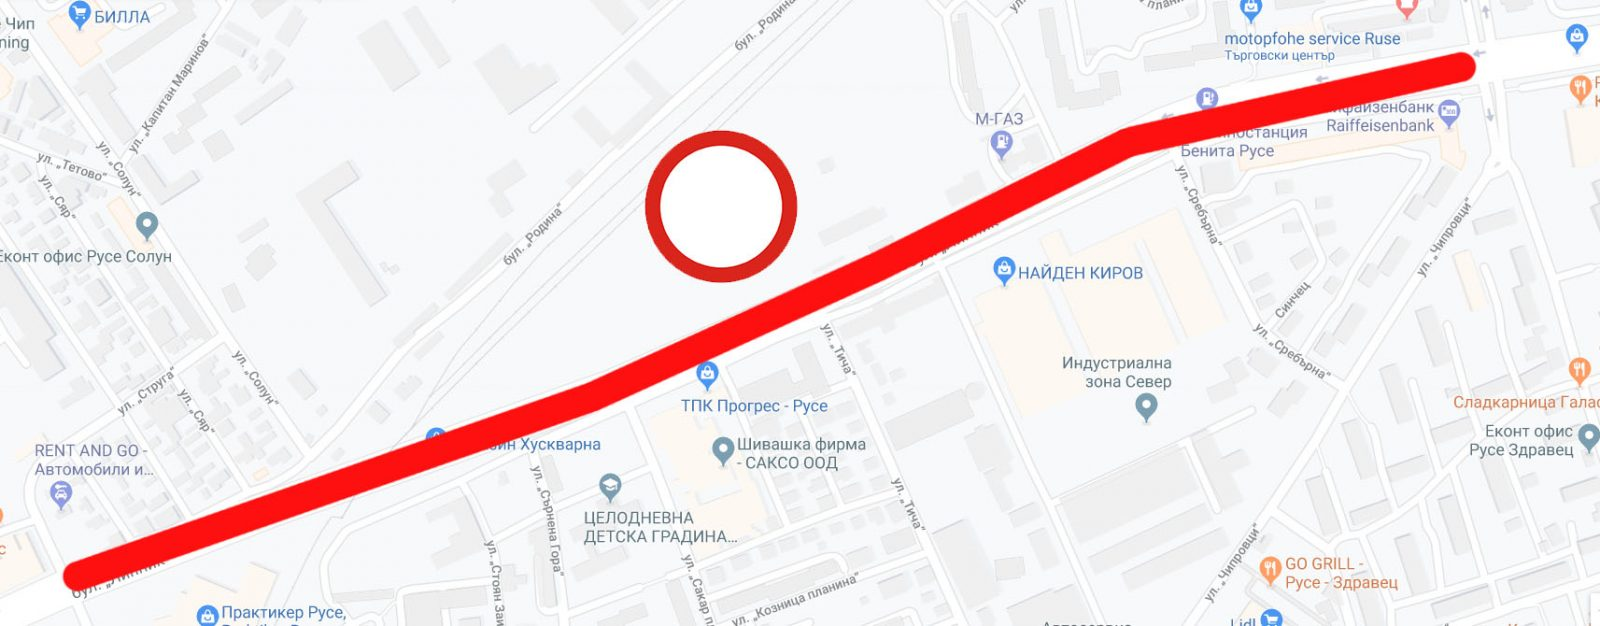 затваряне на бул. липник